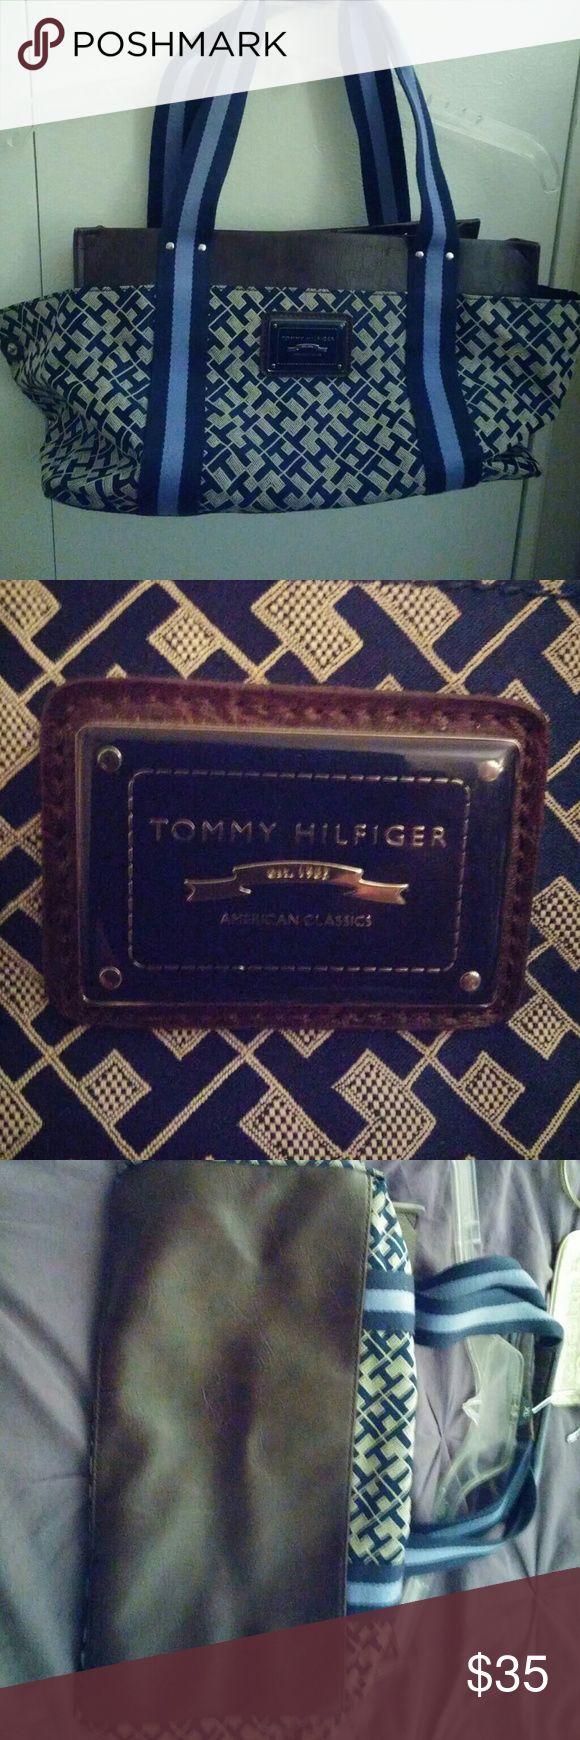 Tommy Hilfiger Purse Tommy Hilfiger purse Tommy Hilfiger Bags Shoulder Bags